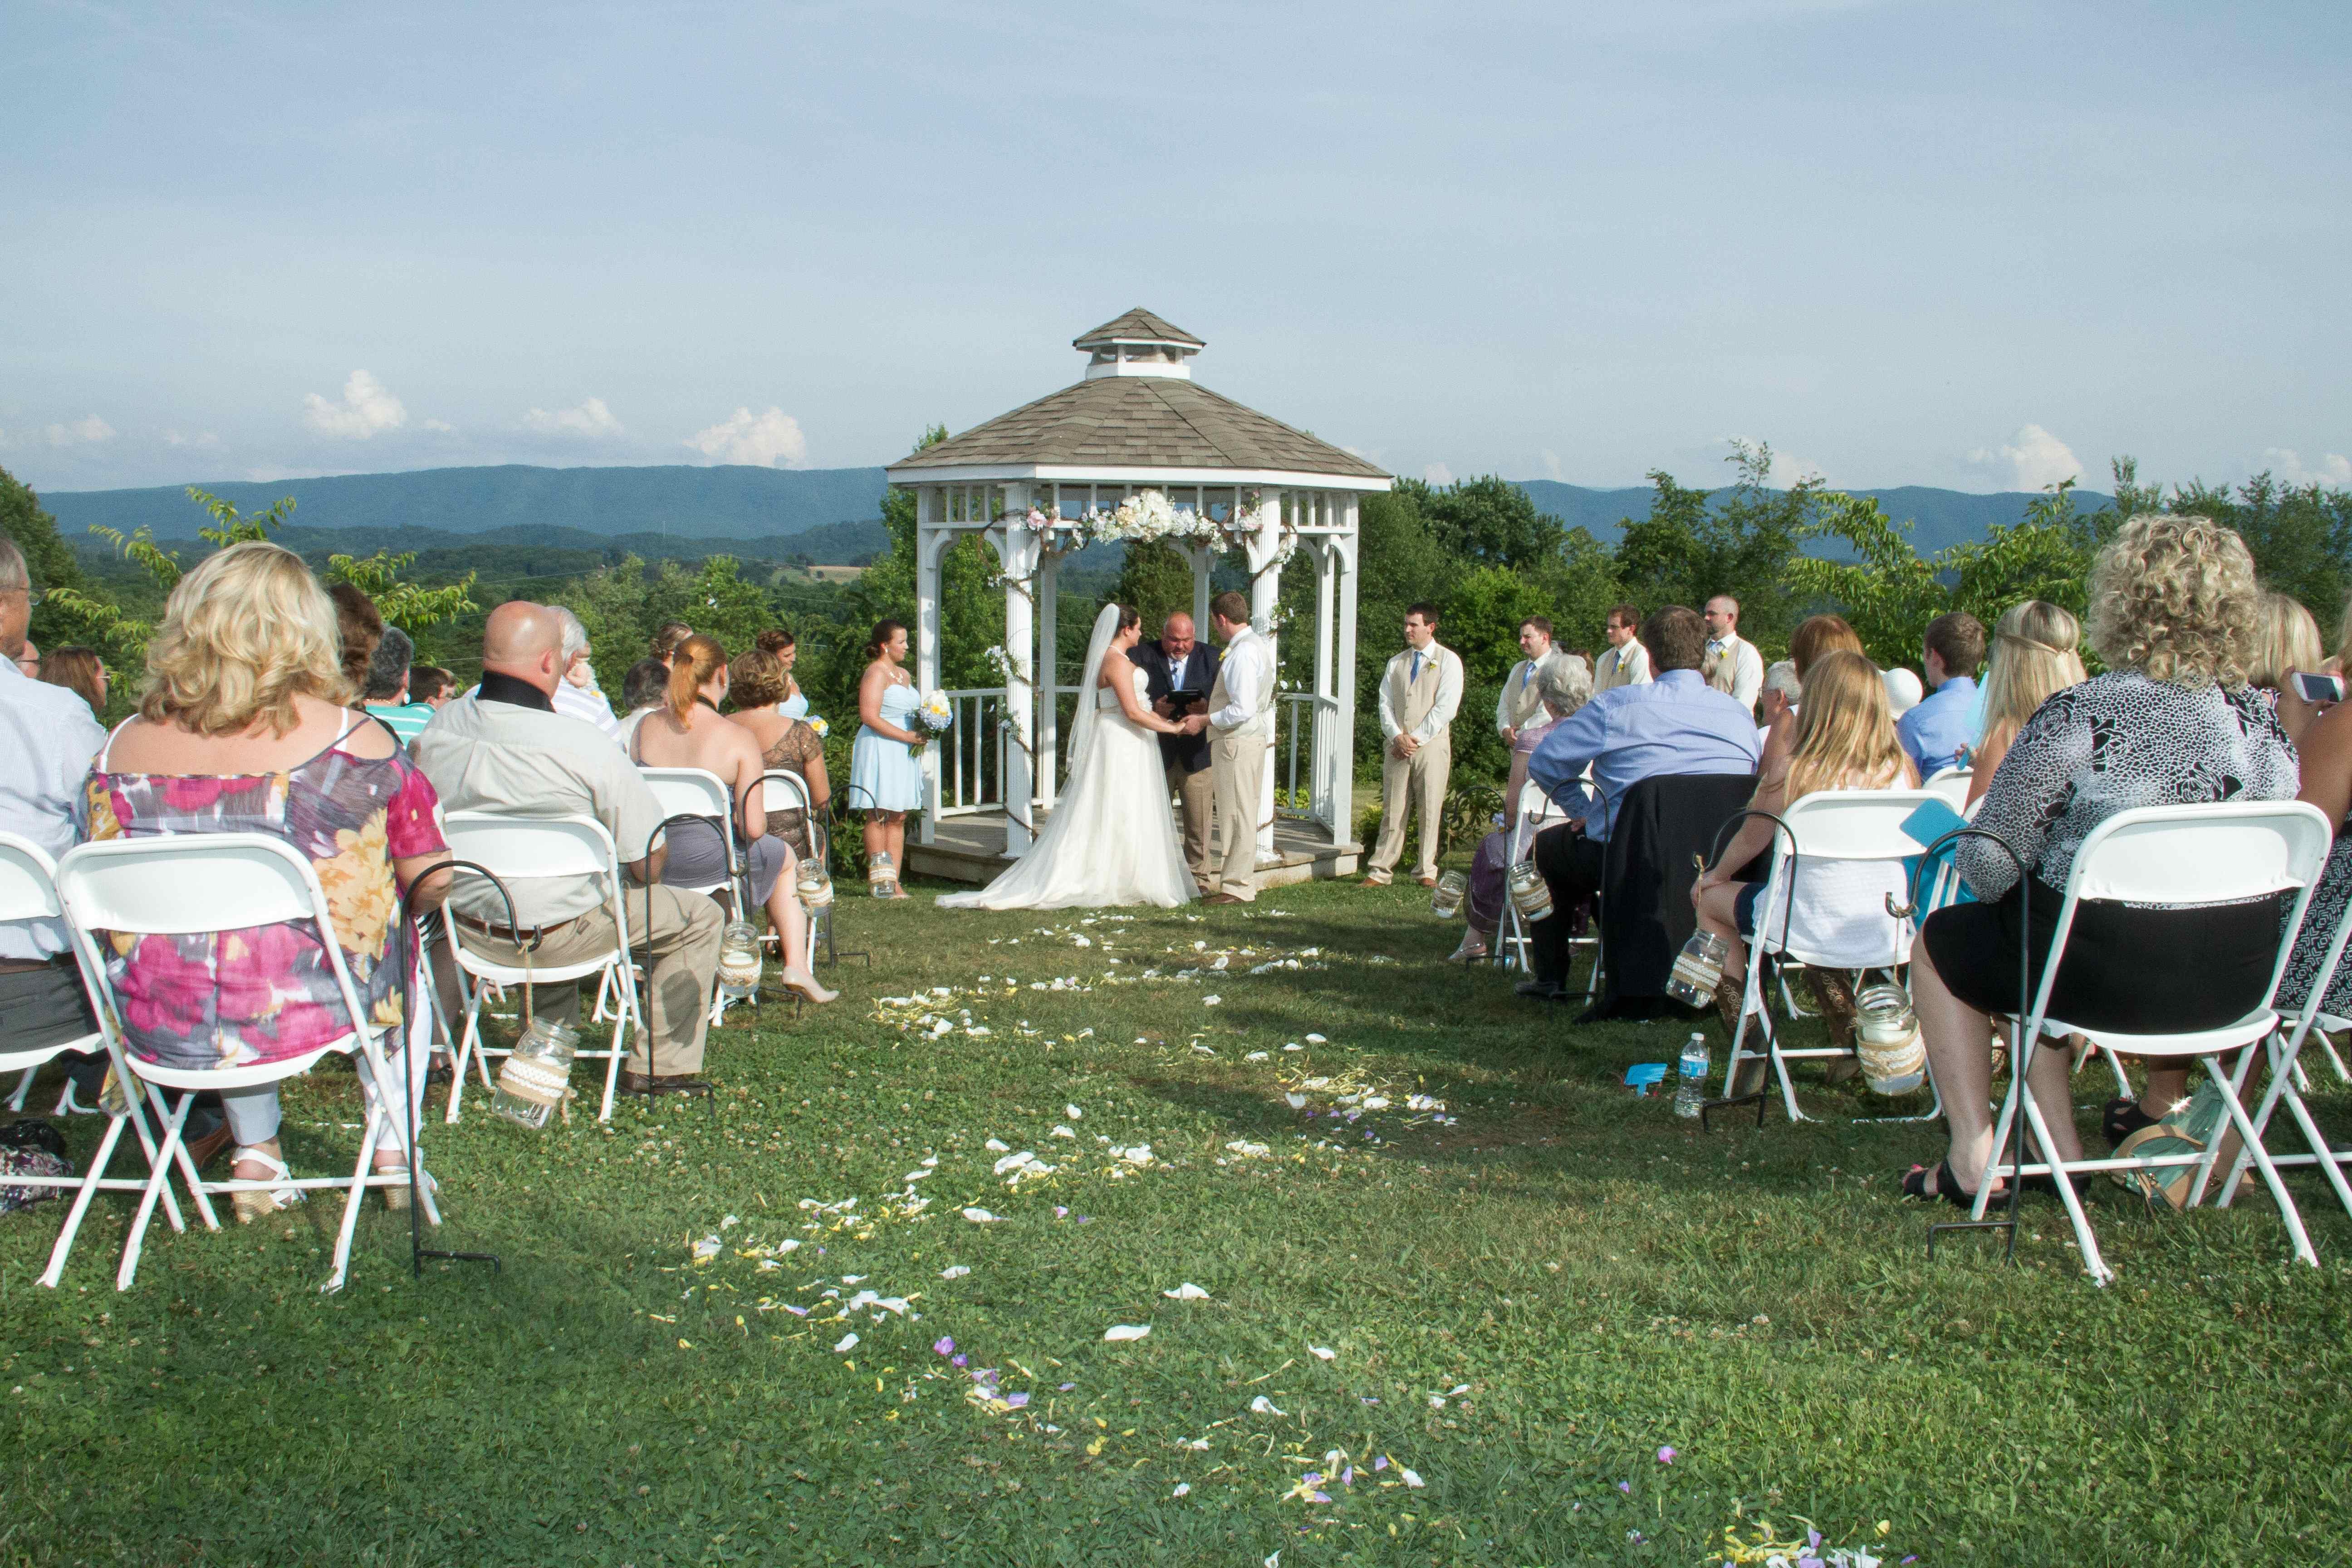 Wedding Decorations - Knoxville djs